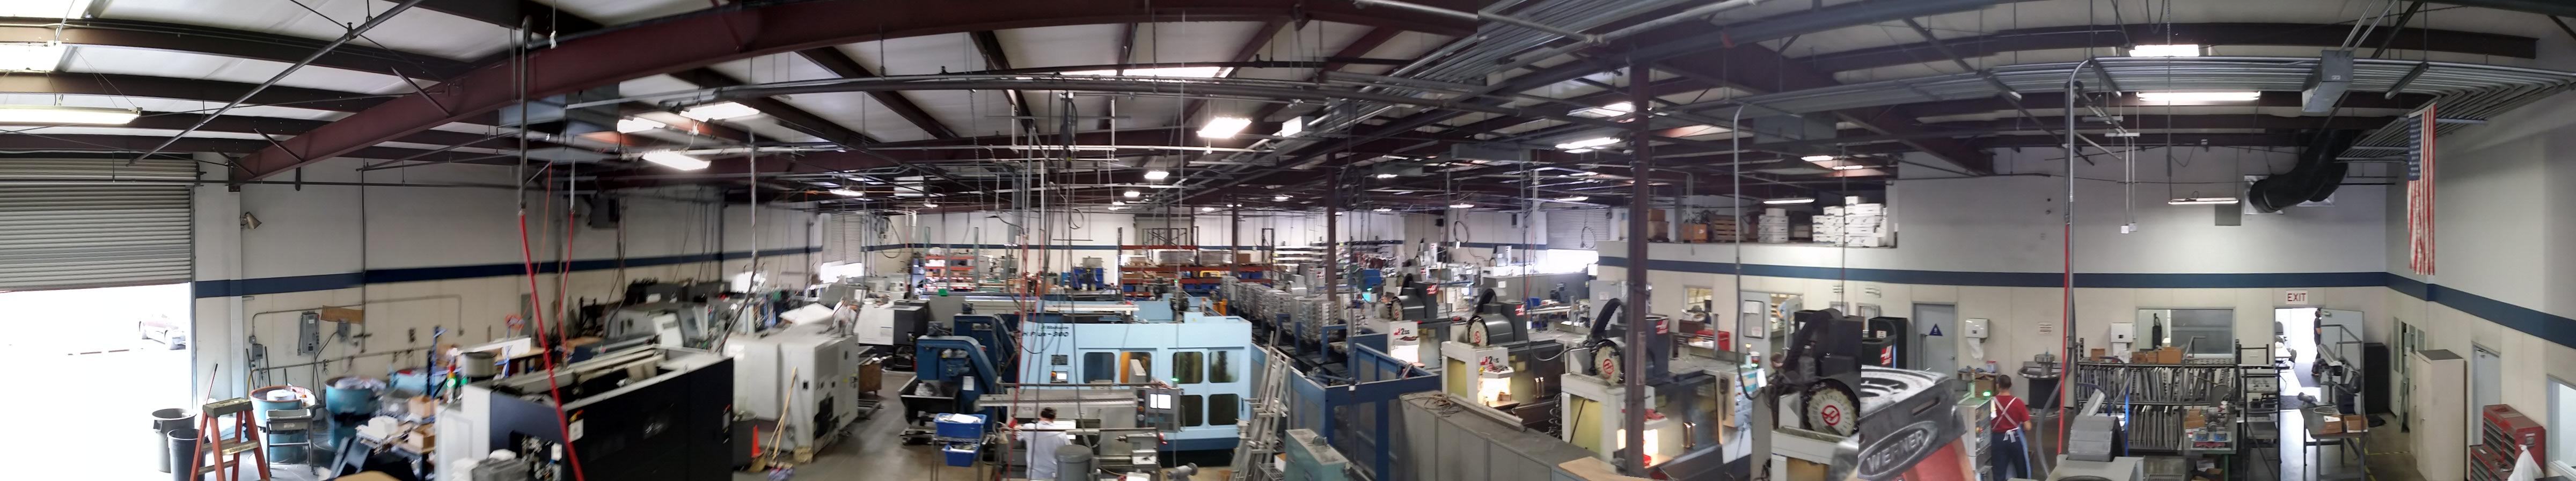 Made-in-California-manufacturer-PNM-shop.jpg